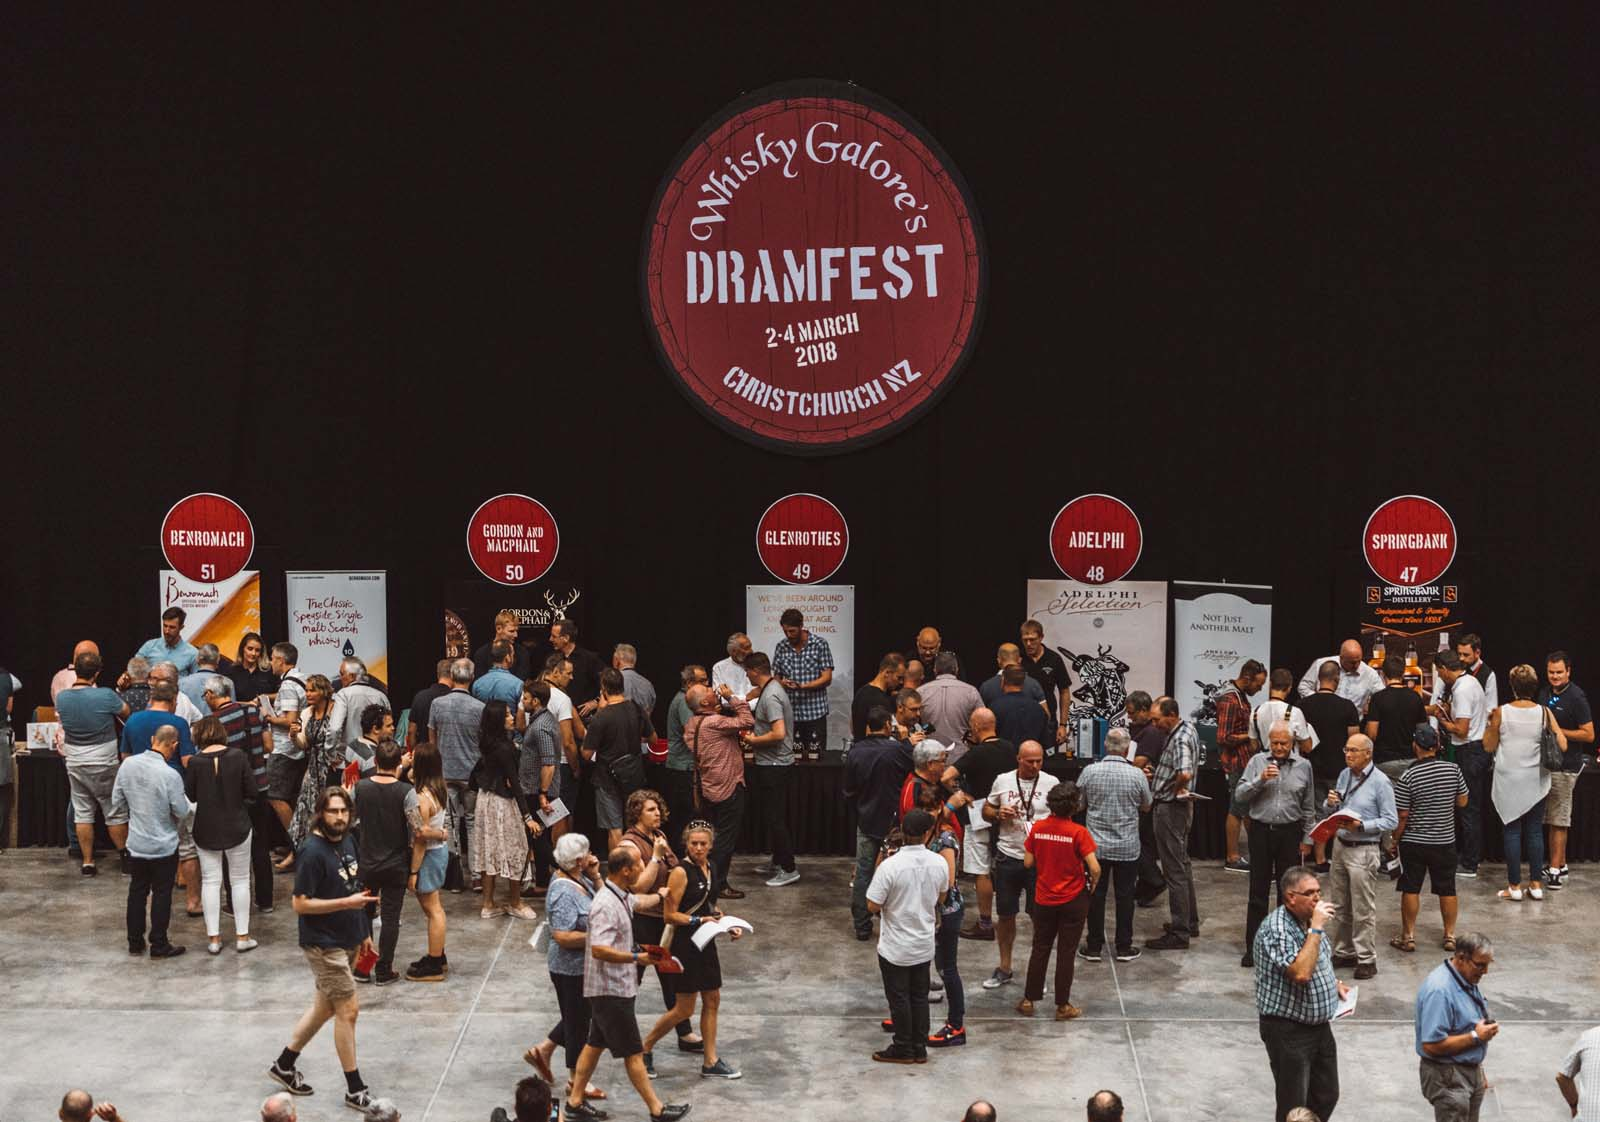 Dramfest 2018 for Whisky Galore-274.jpg